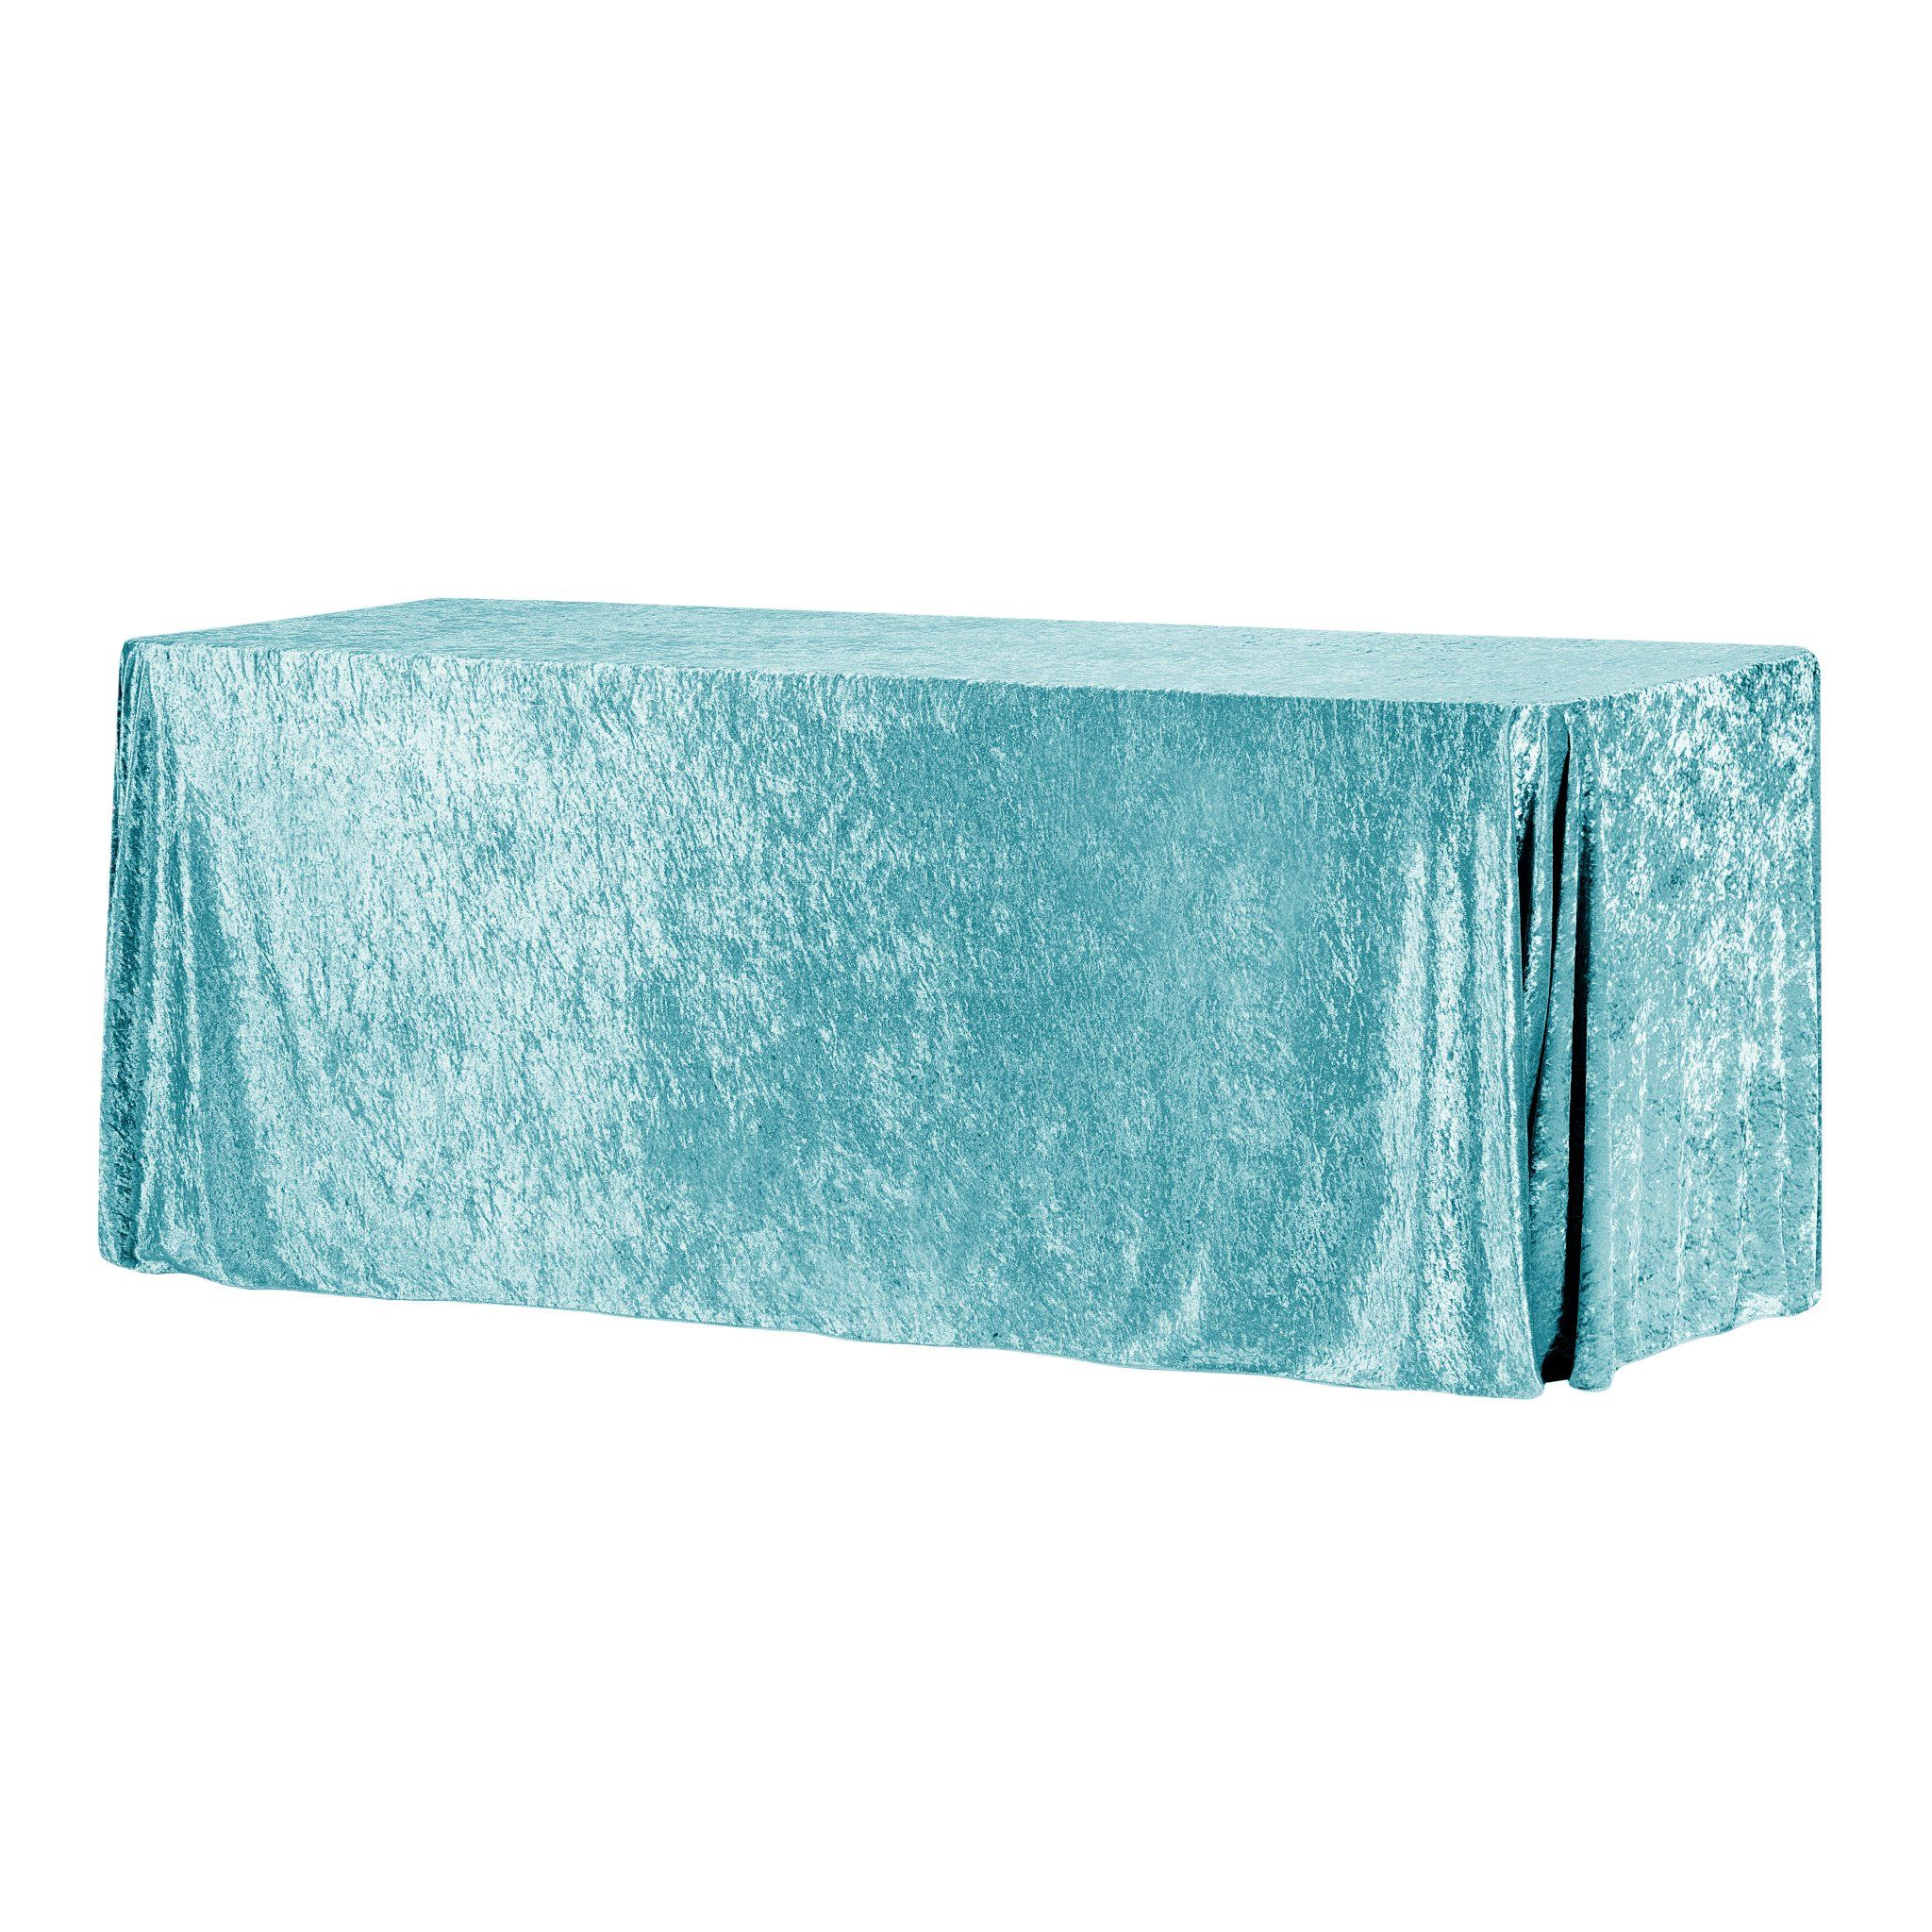 "Velvet 90""x156"" Rectangular Tablecloth - Peacock Teal"